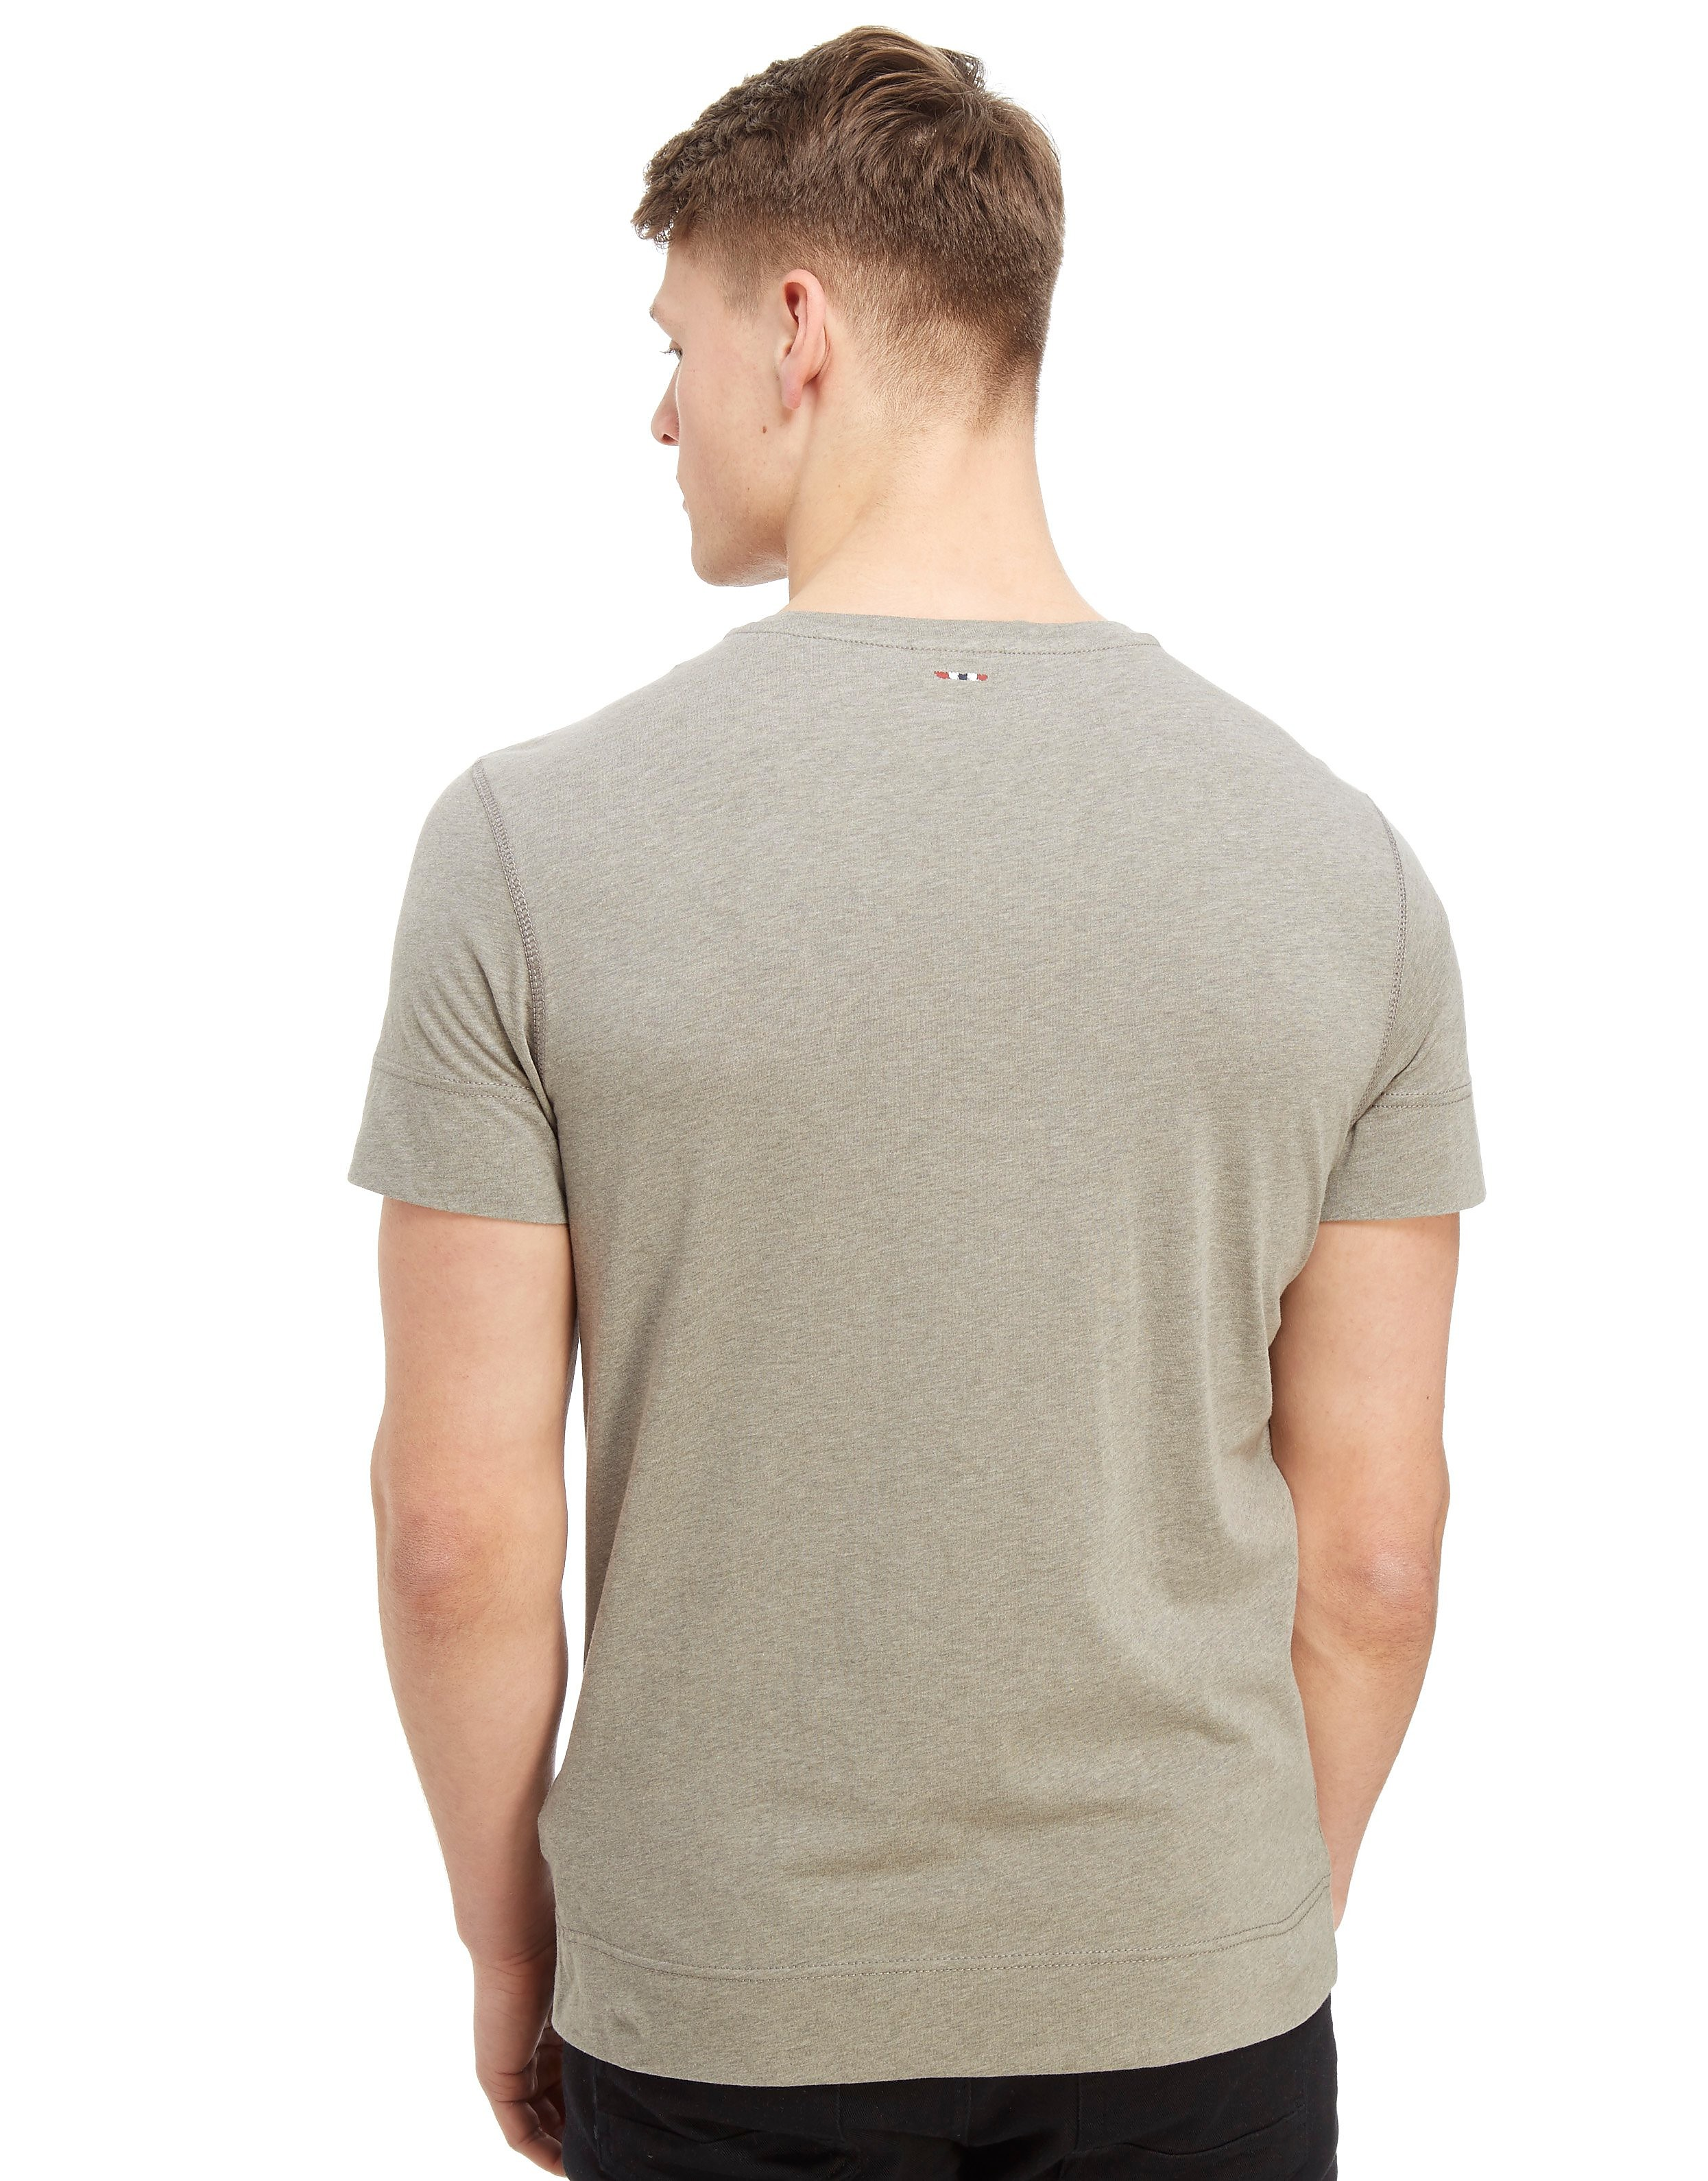 Napapijri T-shirt Shew Homme